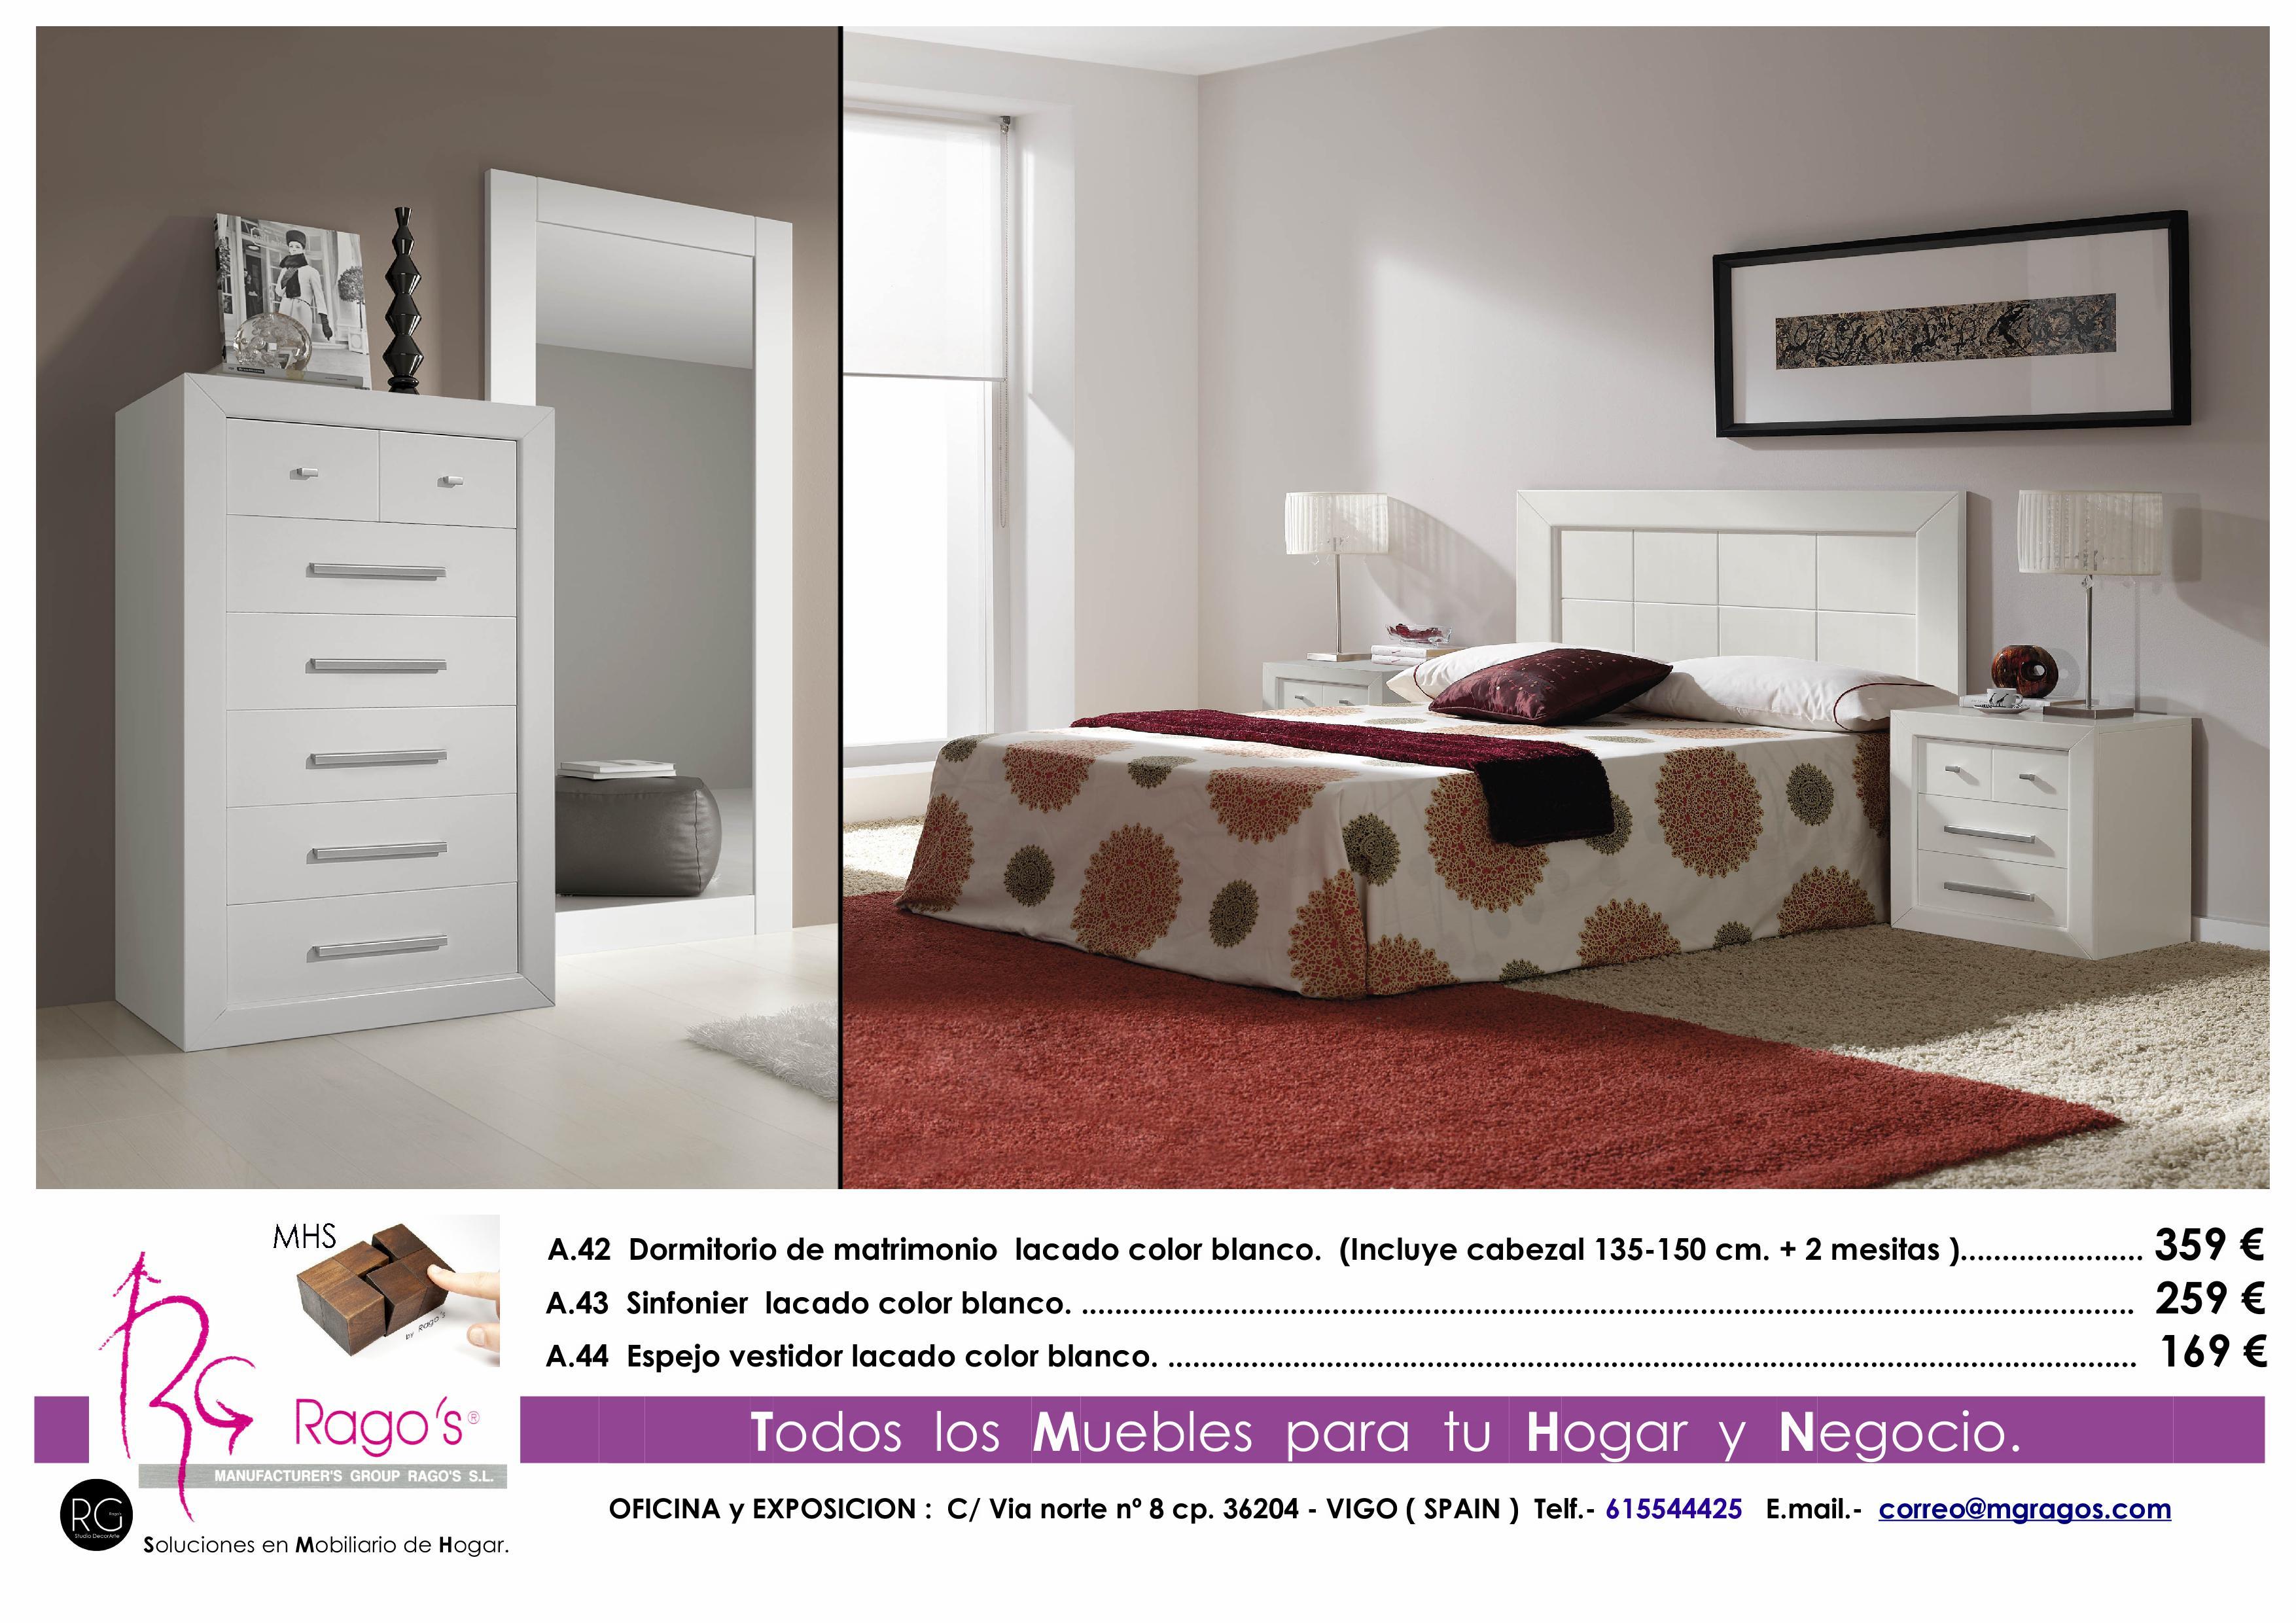 A.42-A.43-A.44 Dormitorio (Cabezal+Mesitas-Sinfonier+Espejo) Pag. nº 6